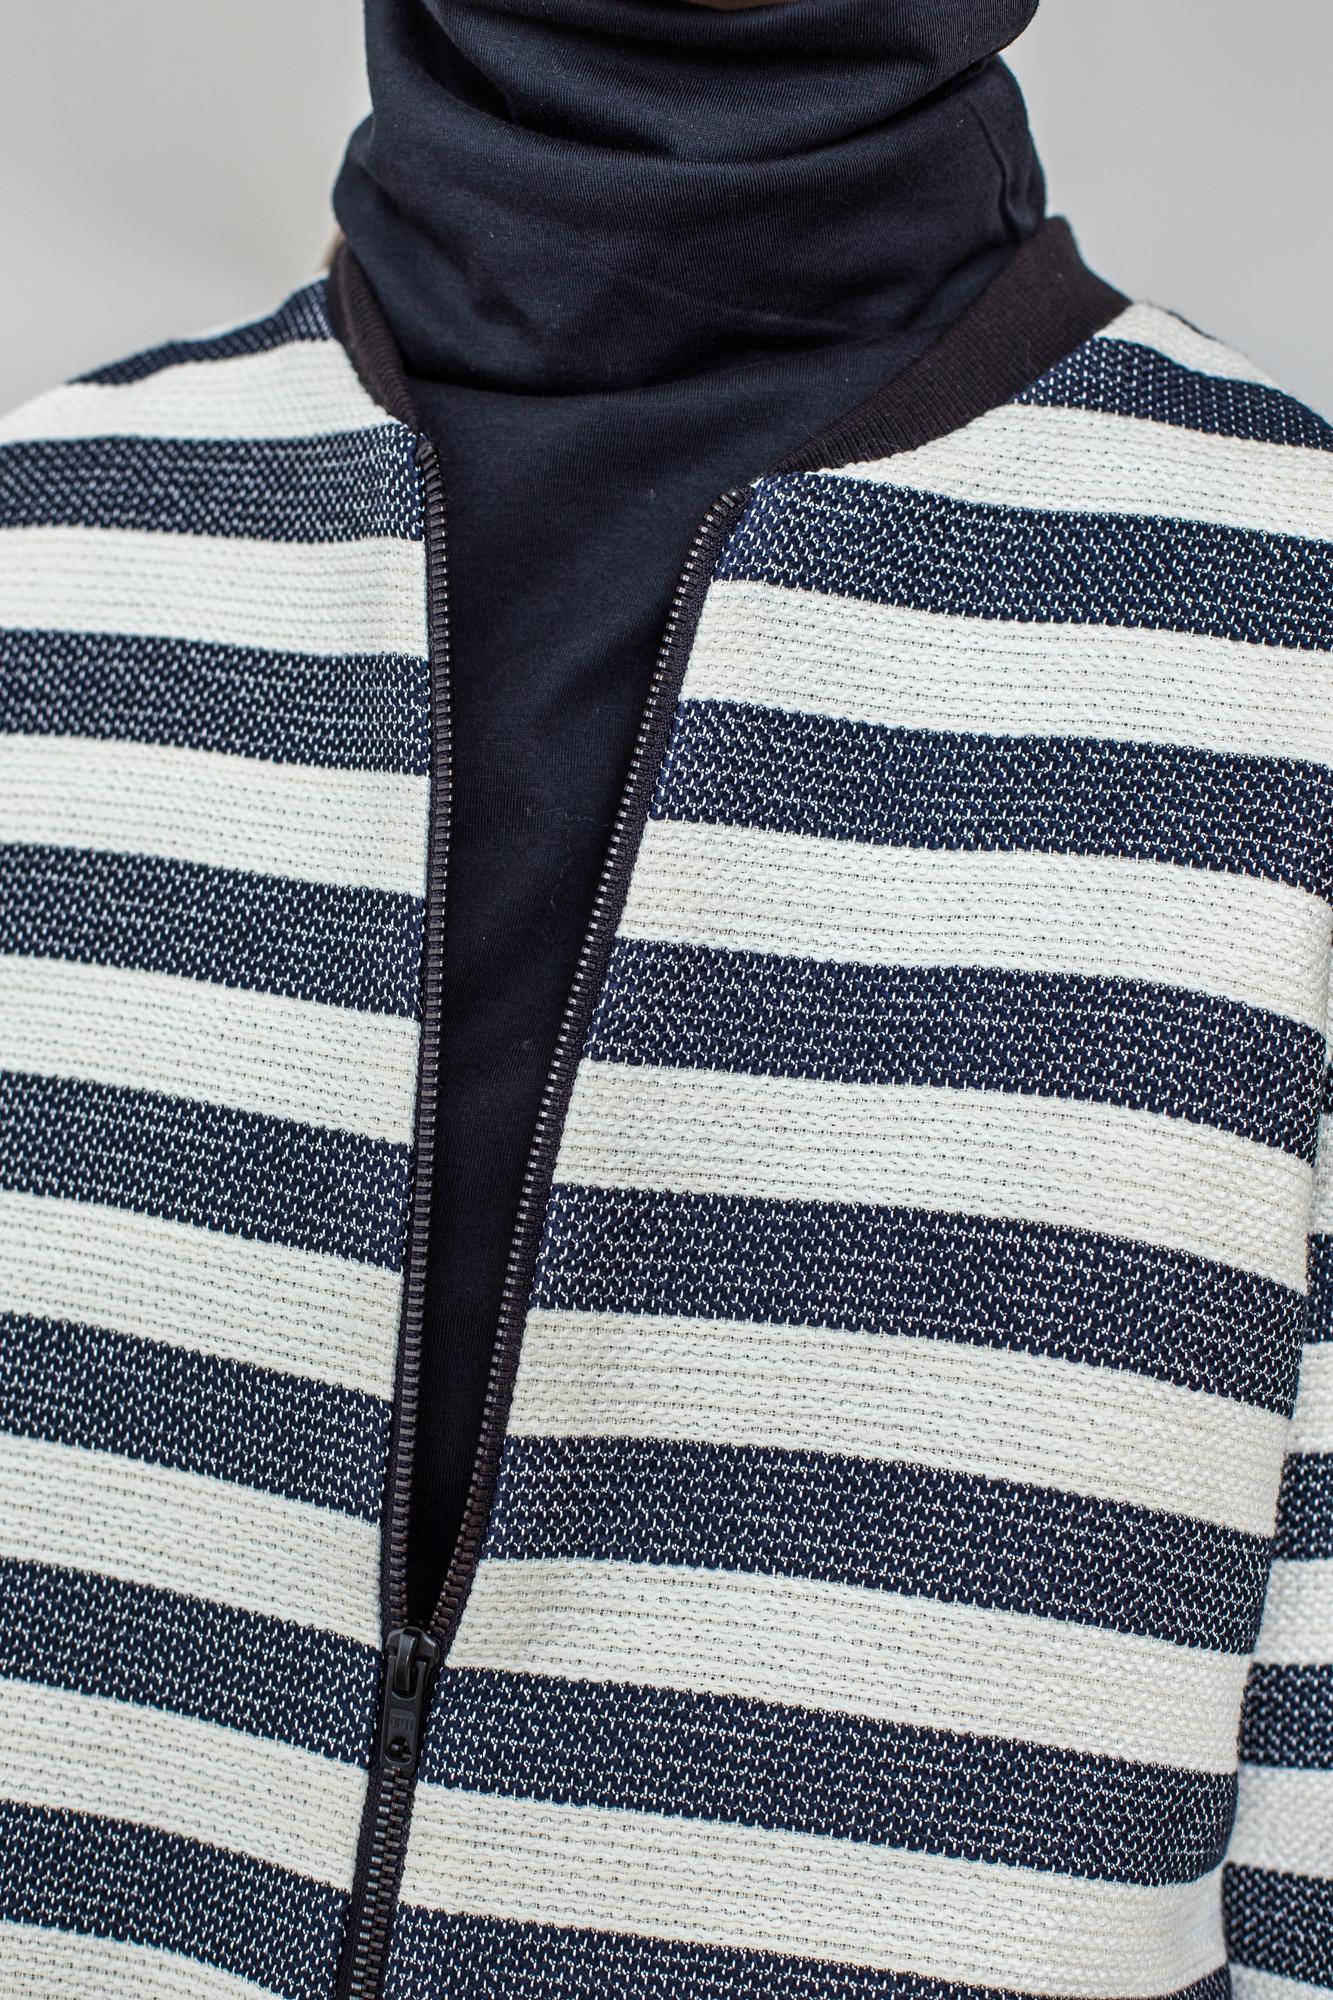 wearenotsisters_wrns_contour-jacket_06